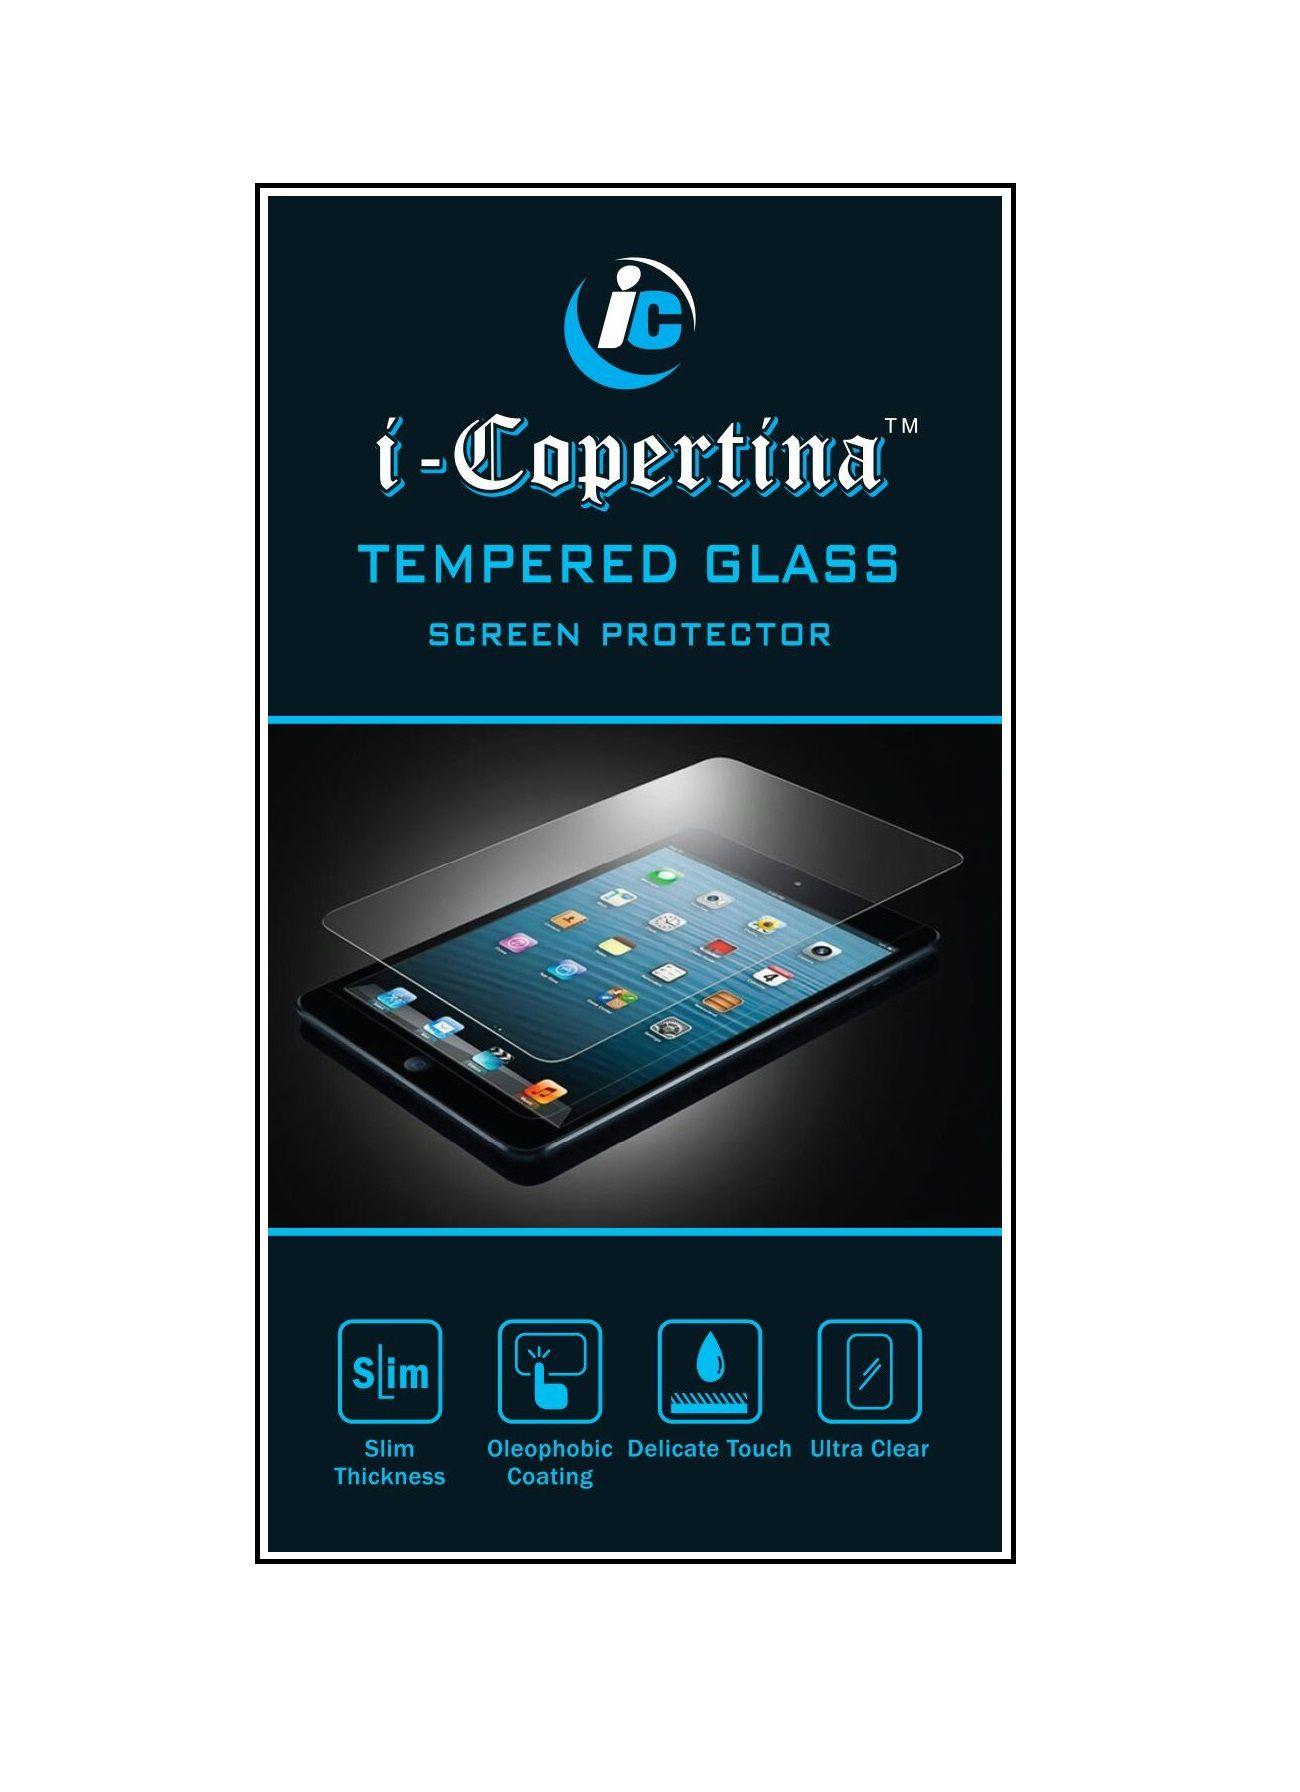 swipe elite plus tempered glass screen guard by icopertina mobile